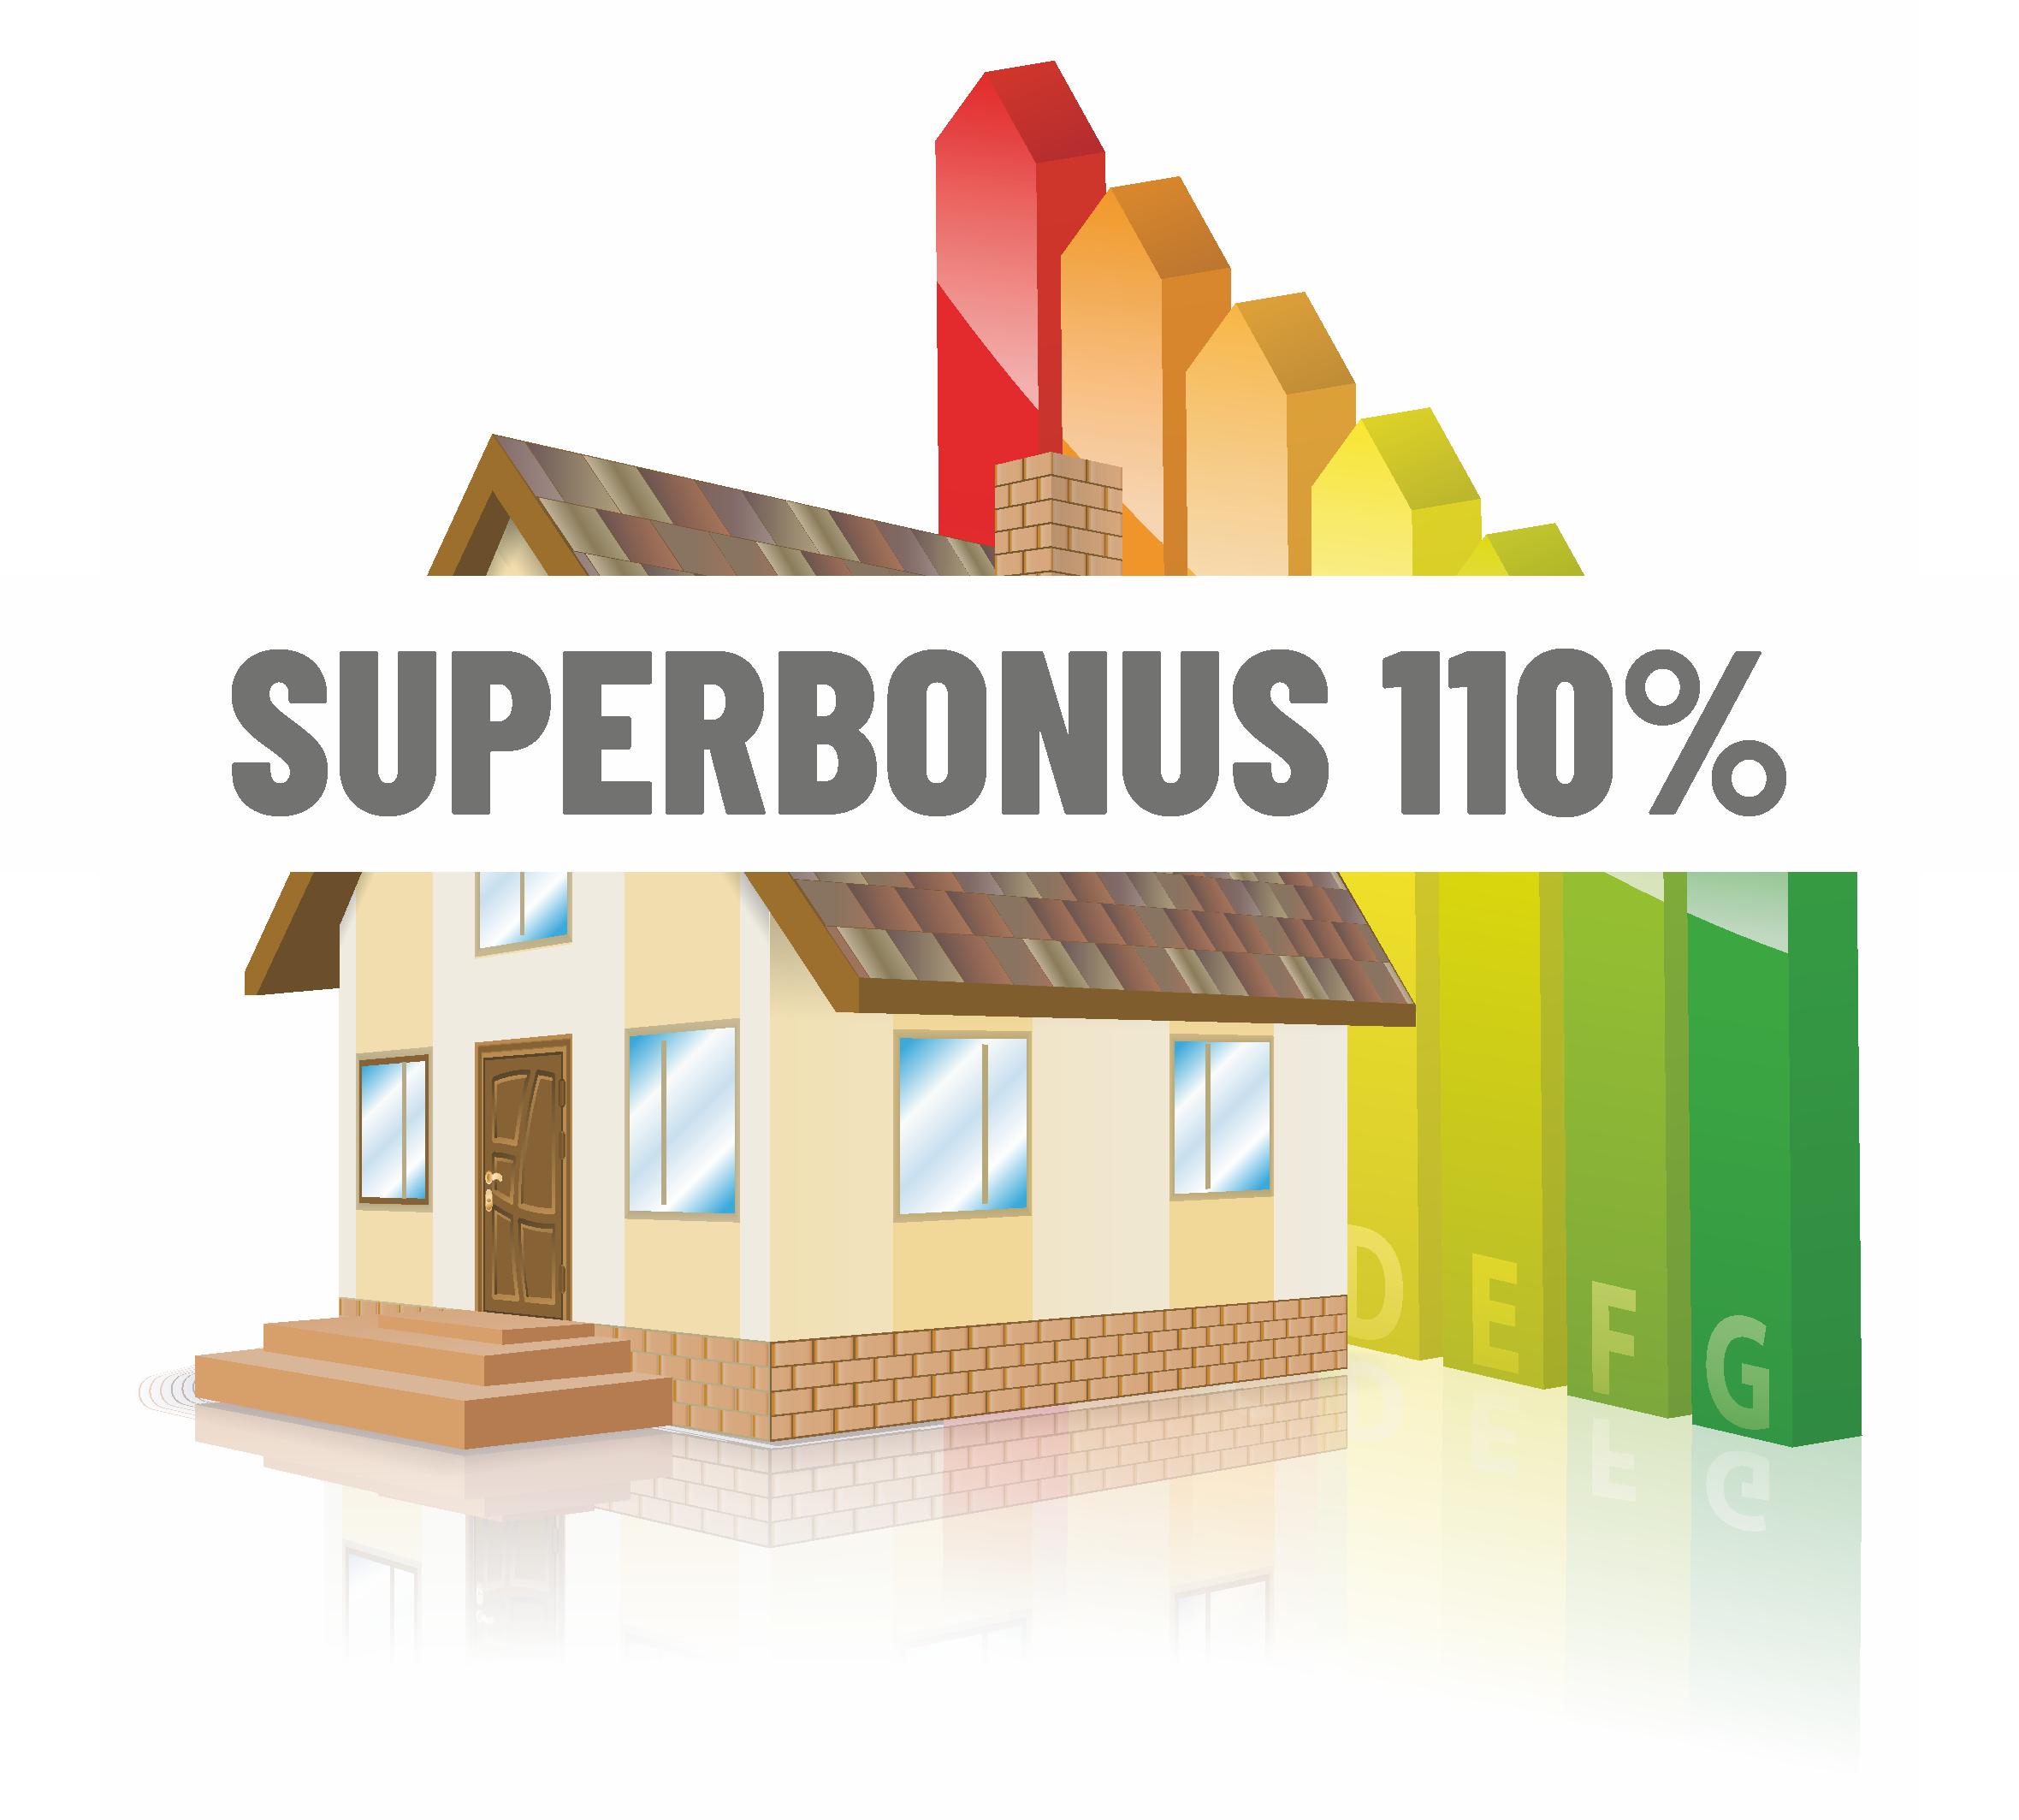 SUPERBONUS110